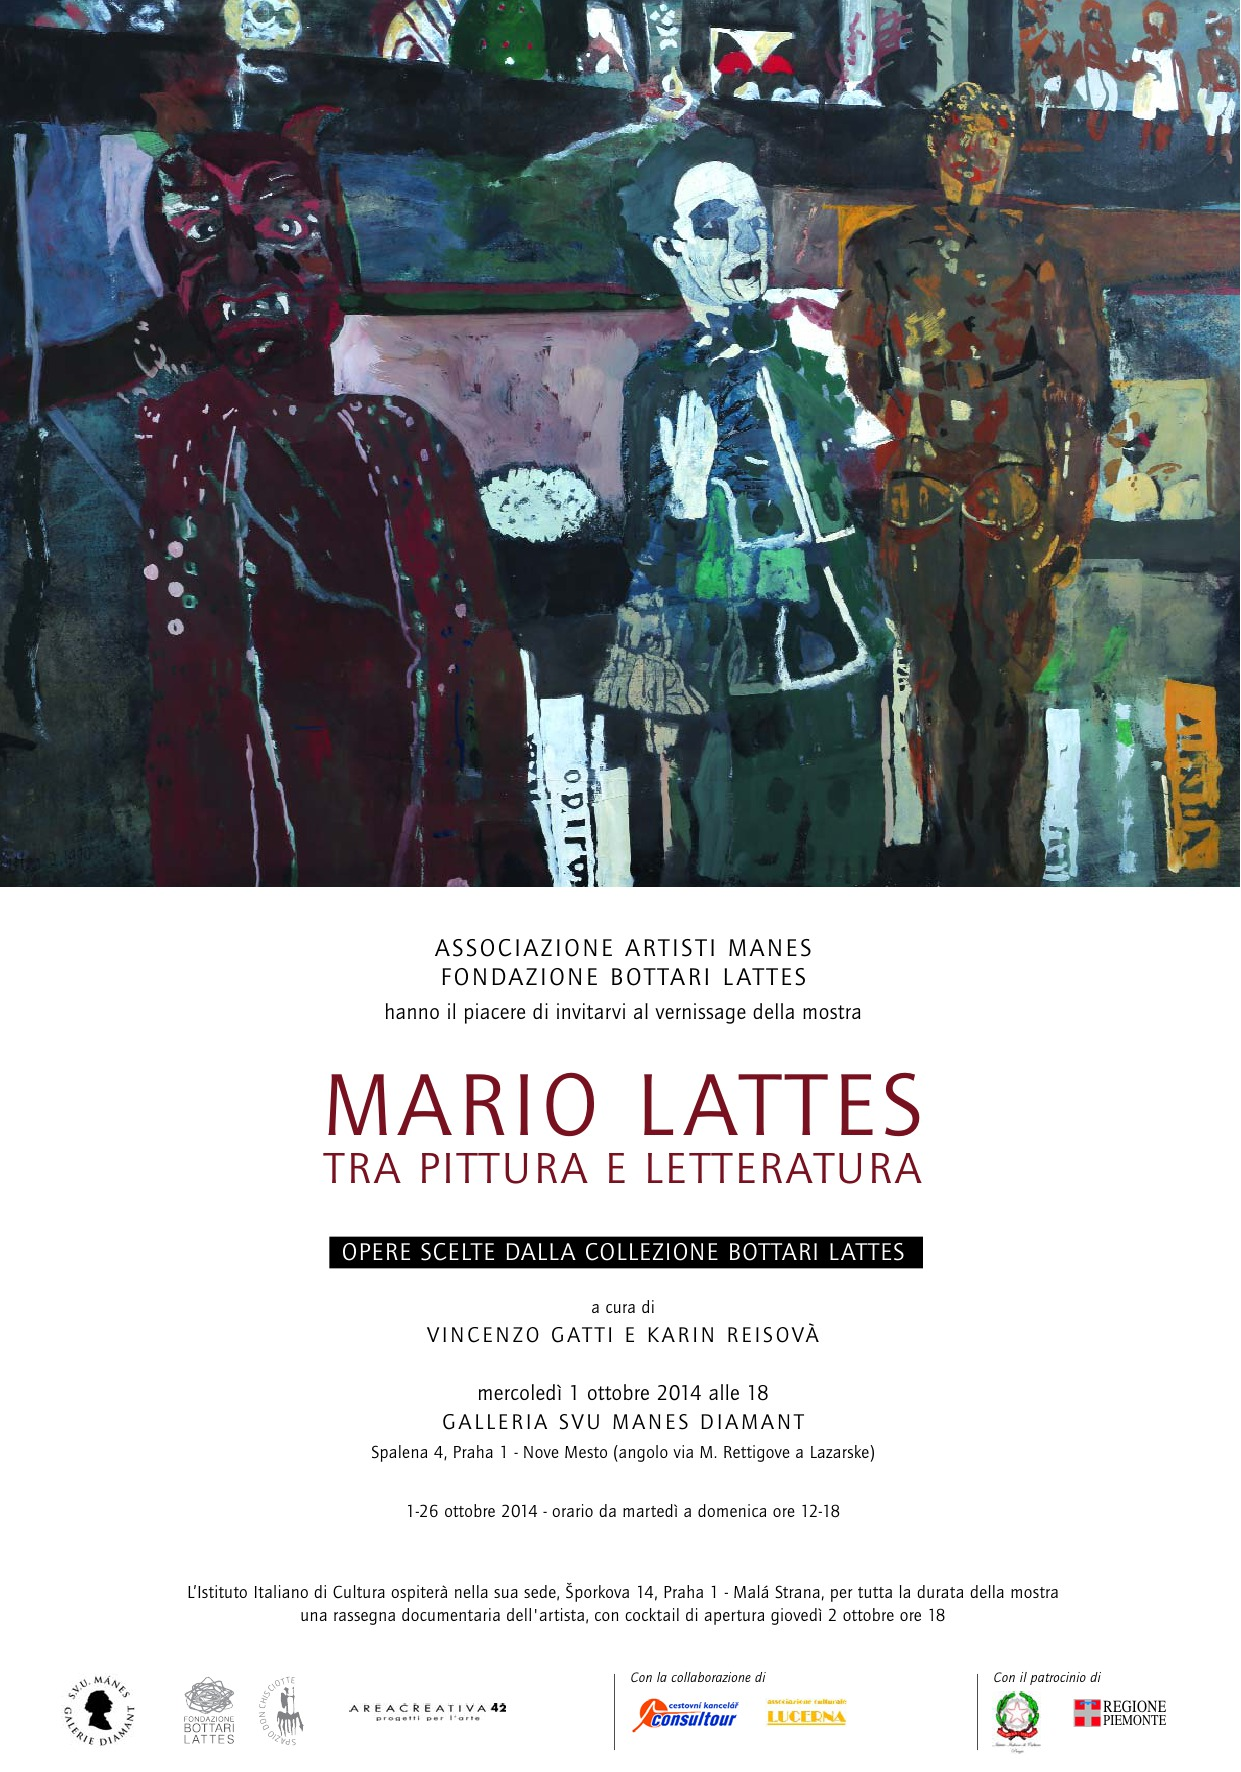 Prague: Mario Lattes, between painting and literature